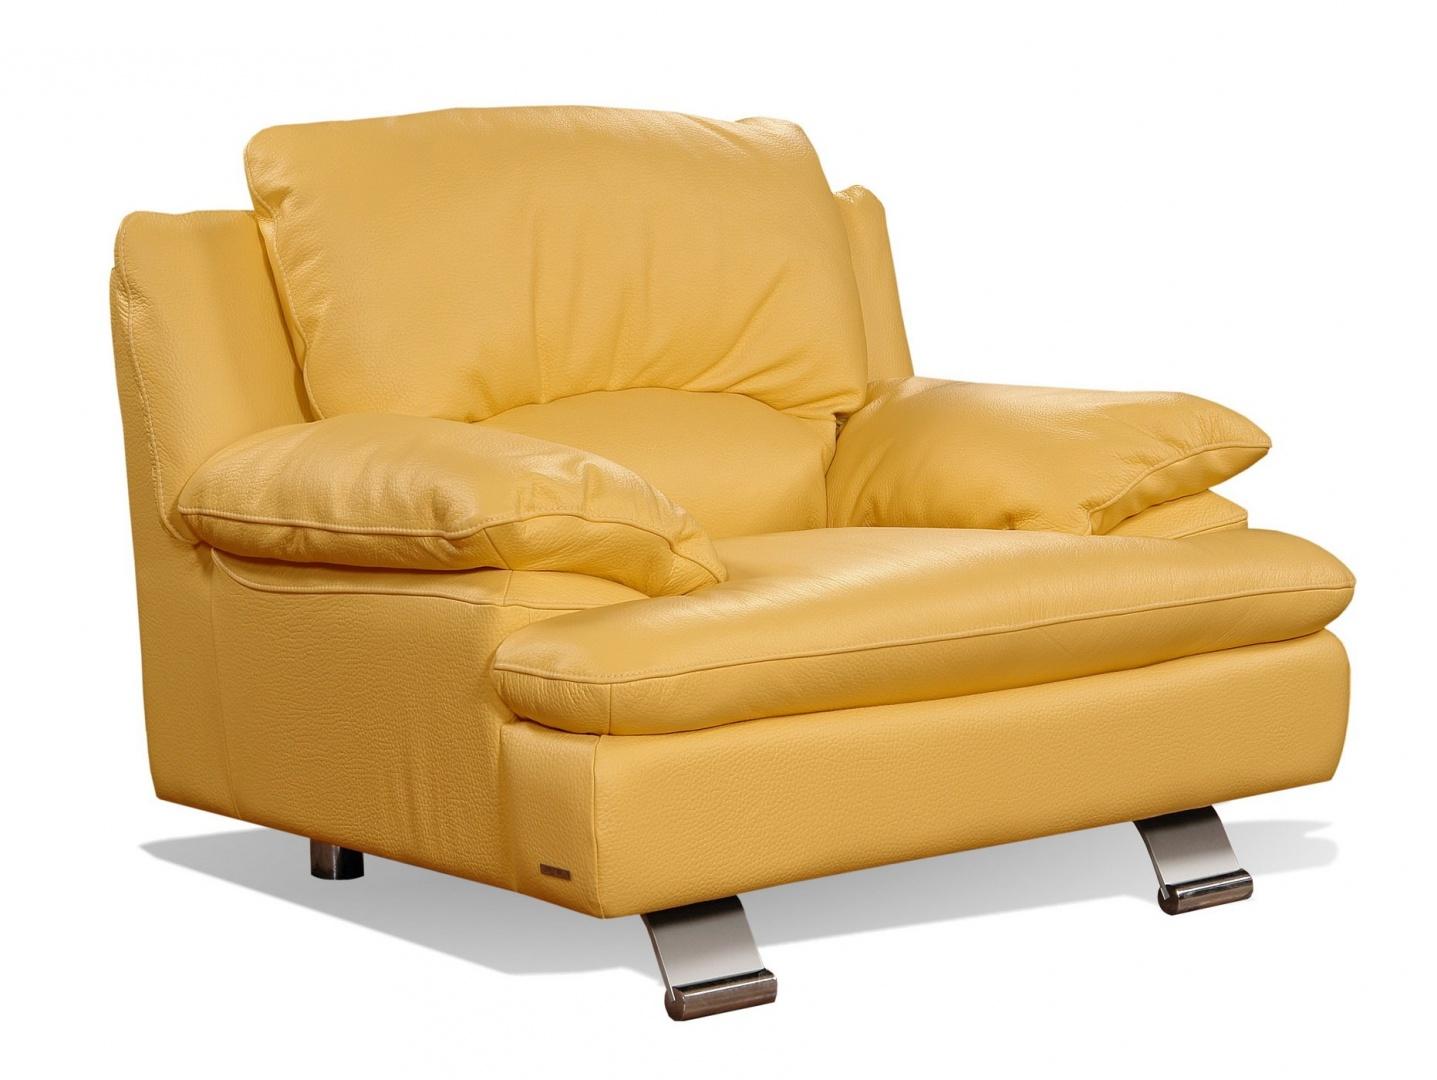 Carlos кресло ТАМ1193 S